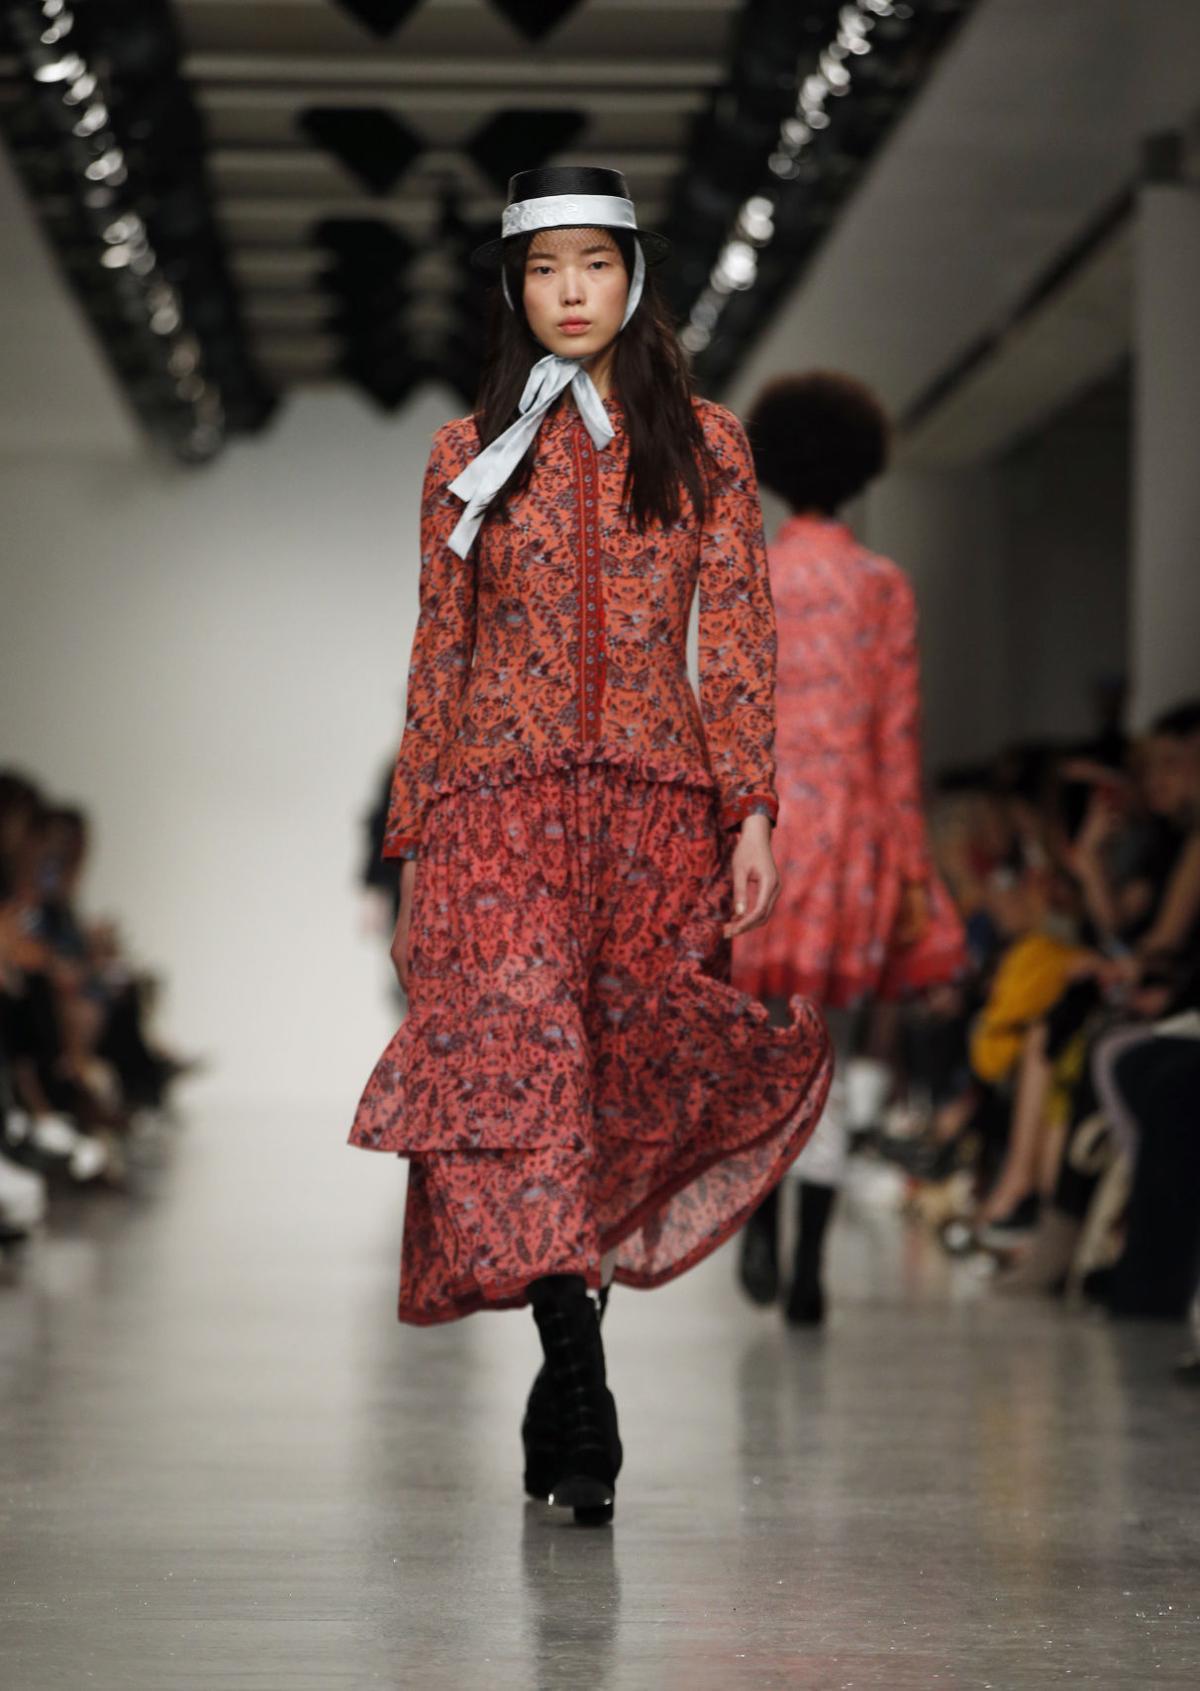 London Fashion Week - Designers 81